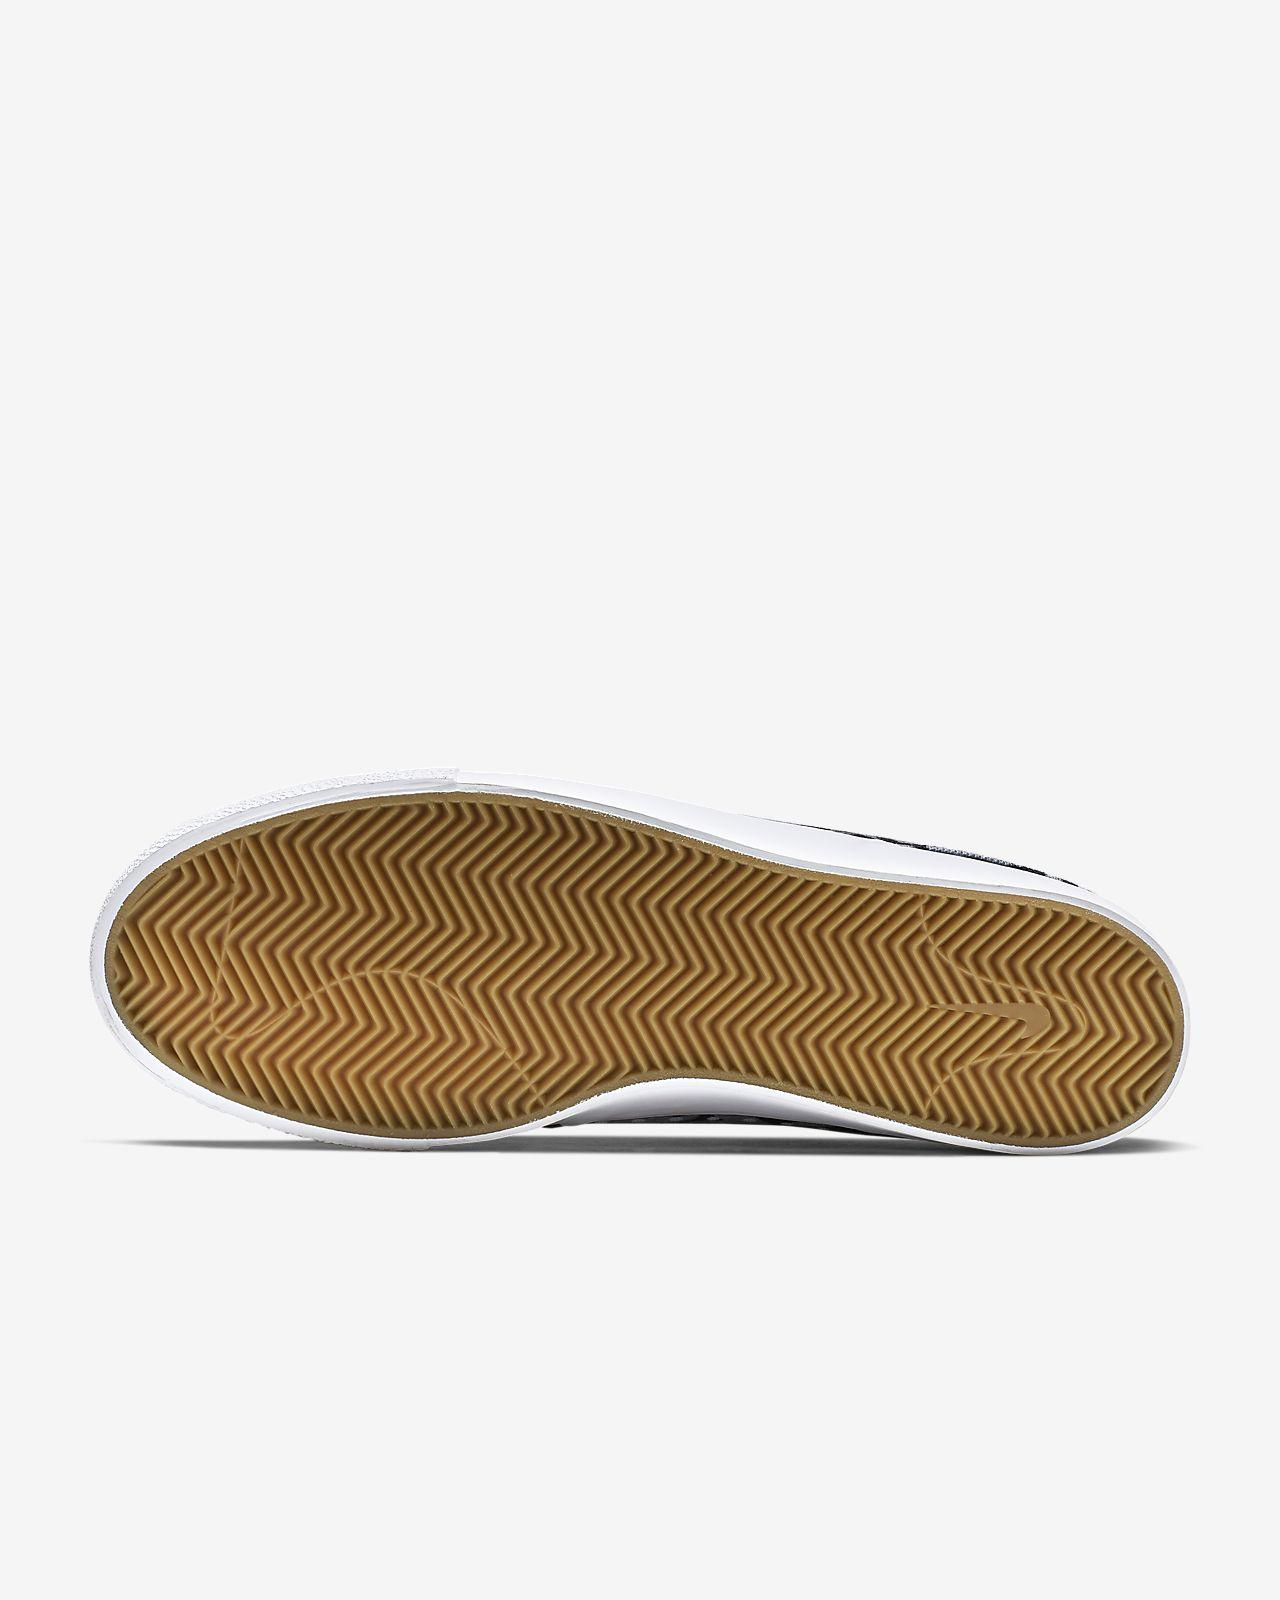 Nike SB Stefan Janoski CNVS Golden Beige Gum Yellow